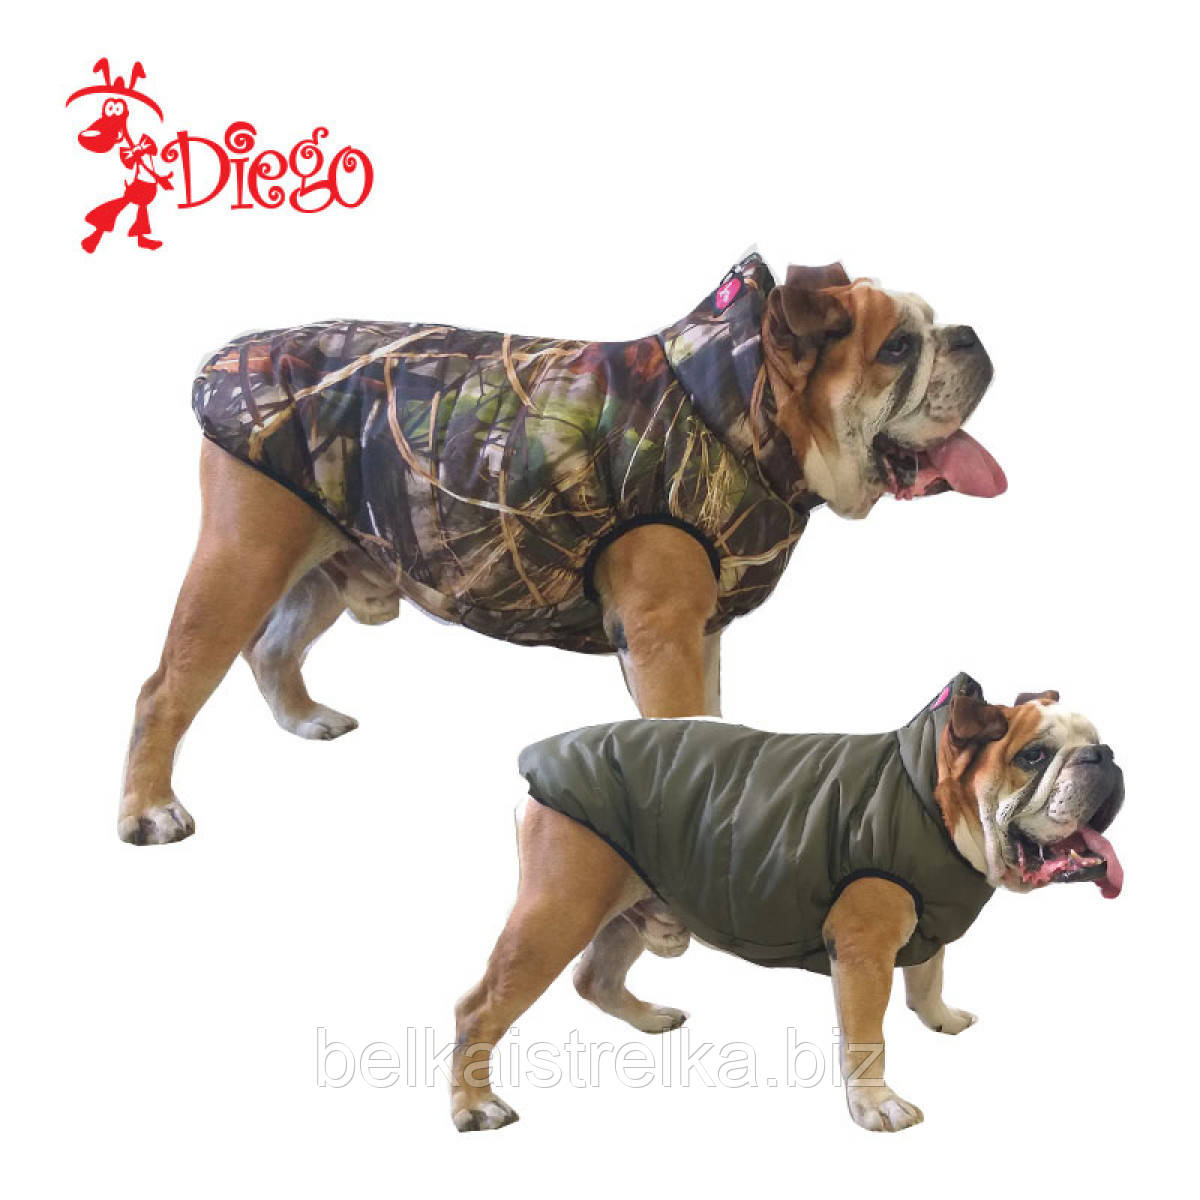 Жилет для собаки двухсторонний DIEGO sport double 5/8 Хантер, размер 5